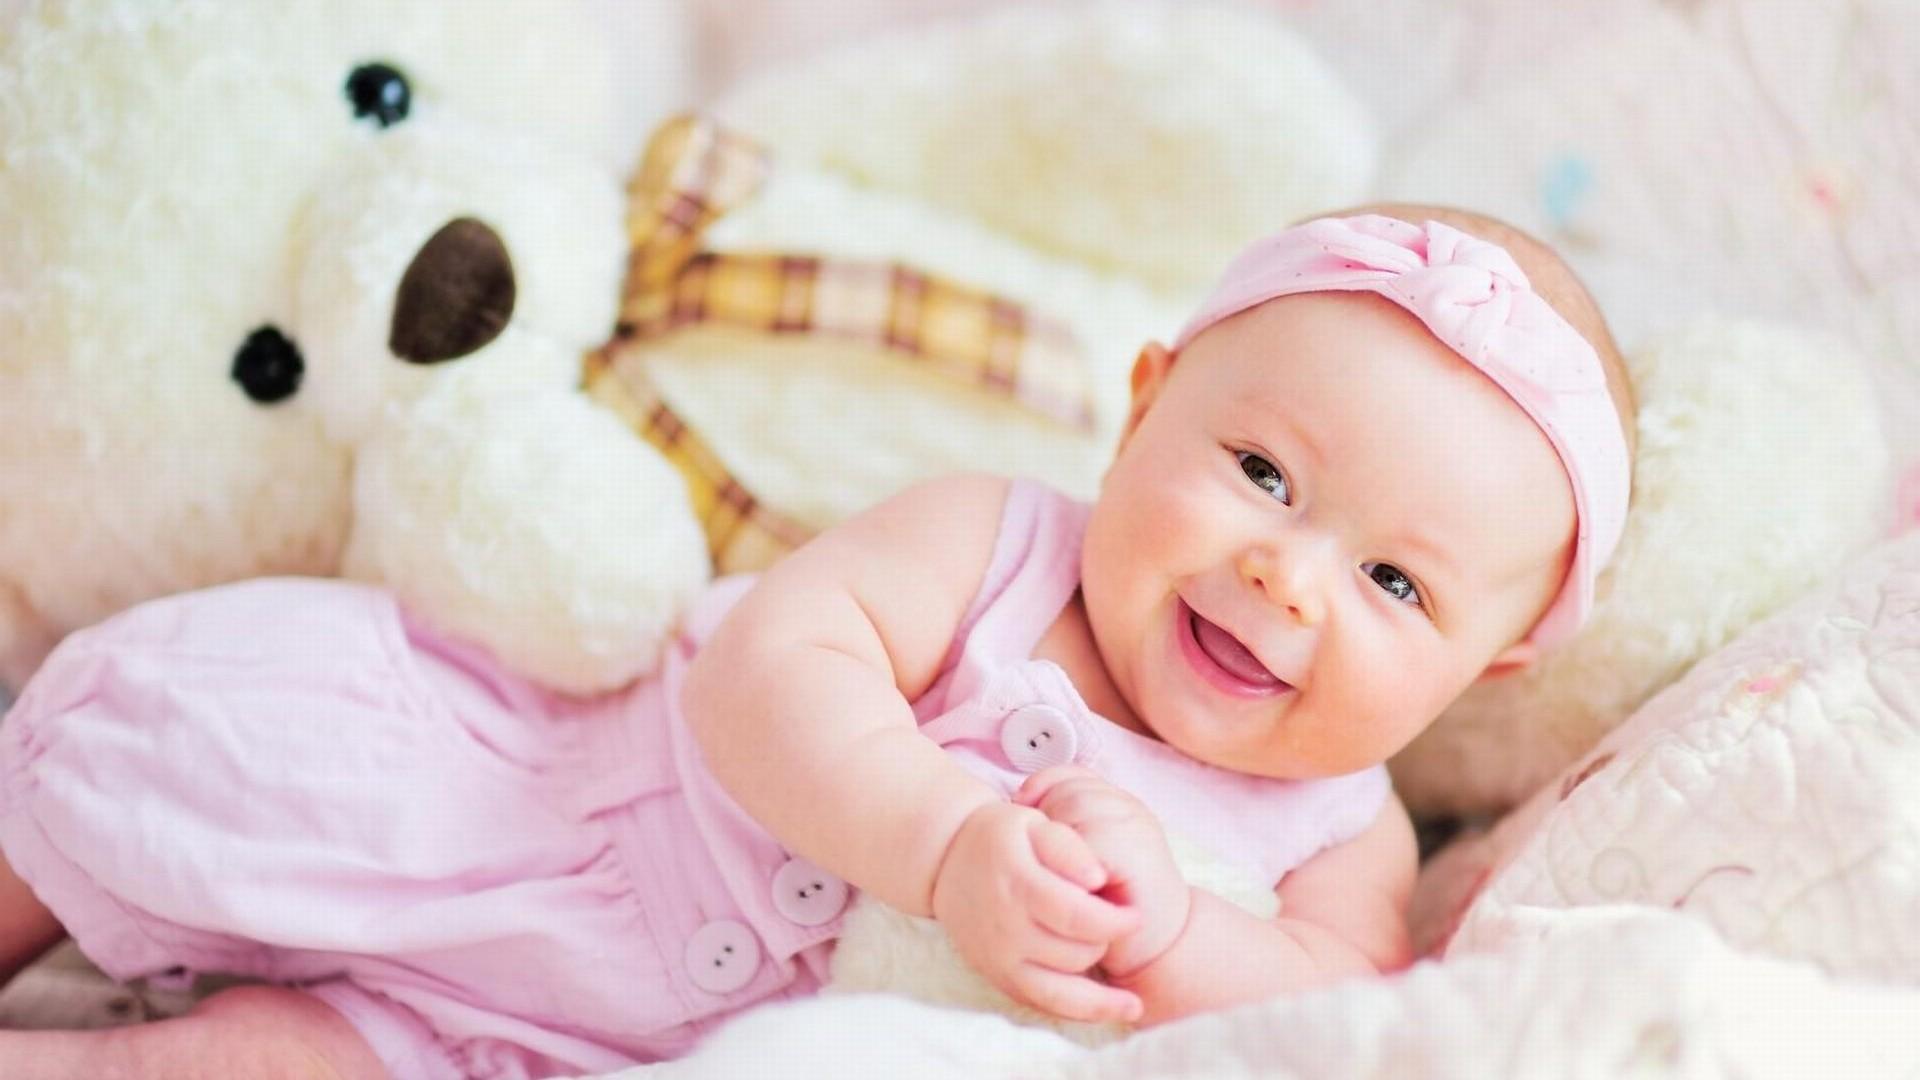 Cute Boy Babies Wallpapers Free Download Baby Desktop Wallpaper 183 ① Wallpapertag